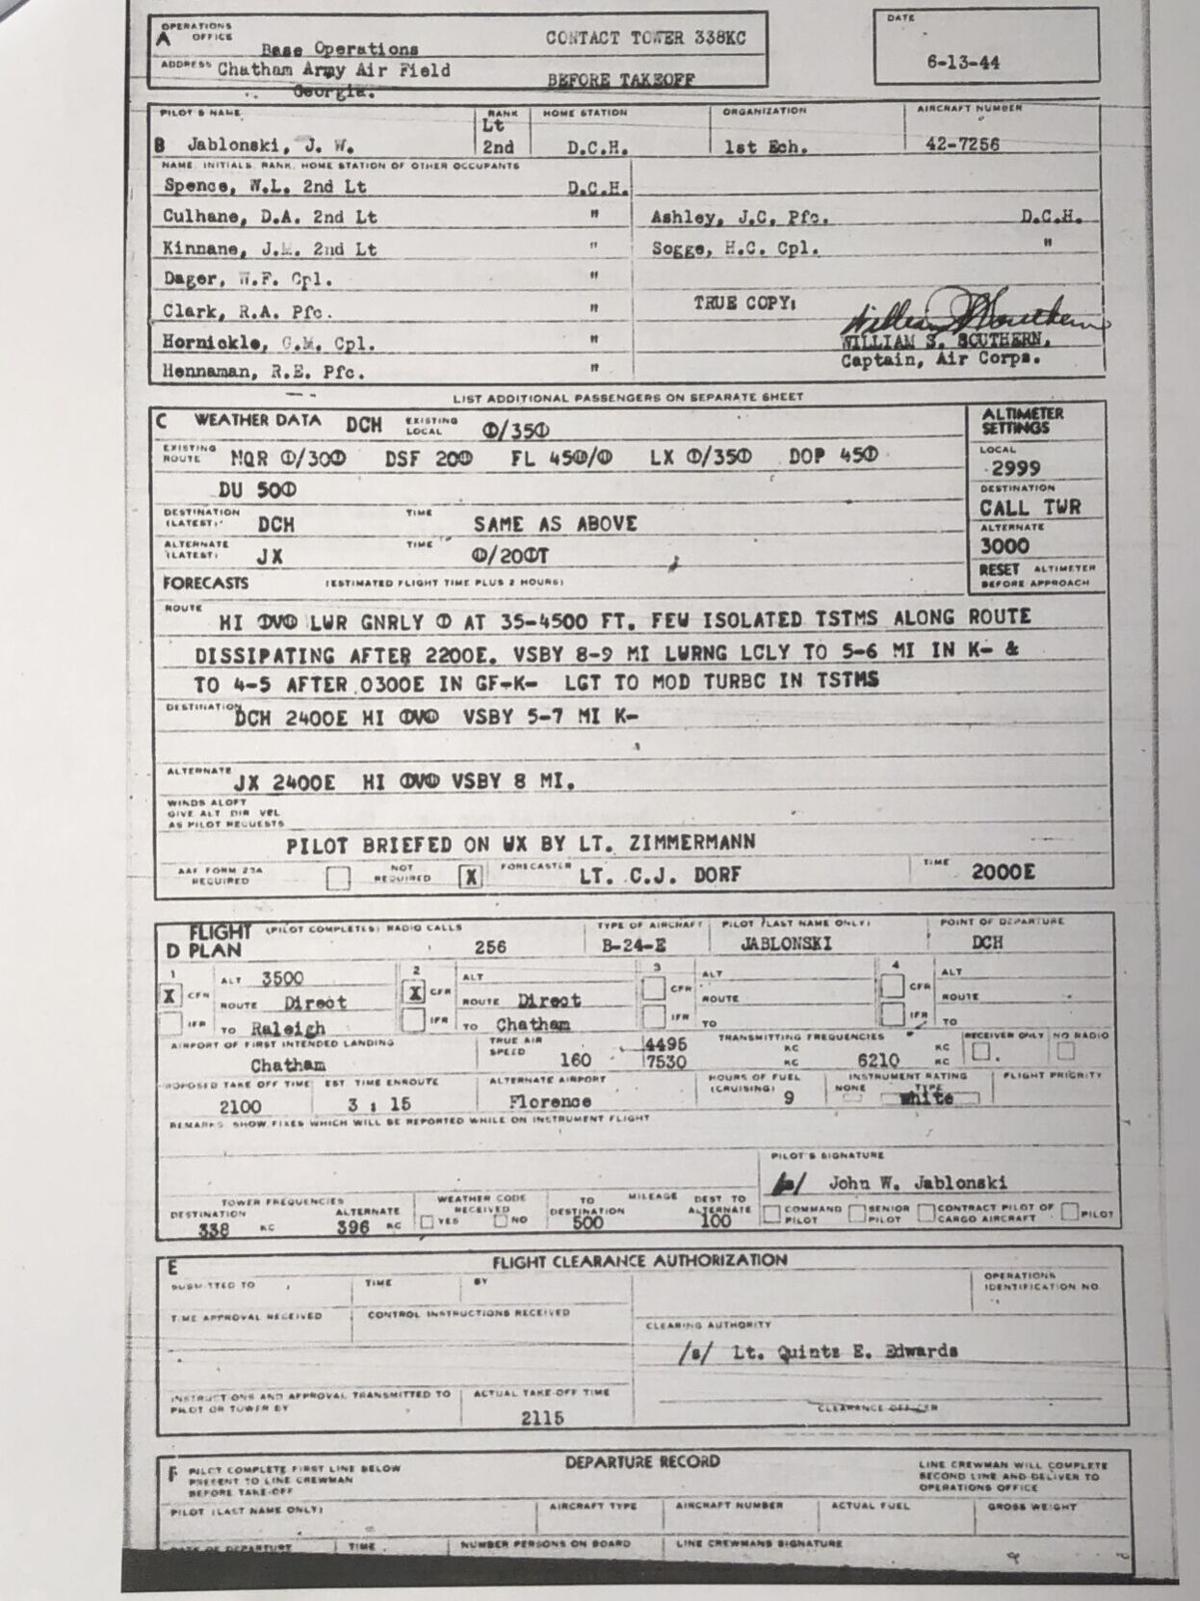 crash investigation page 3.JPG